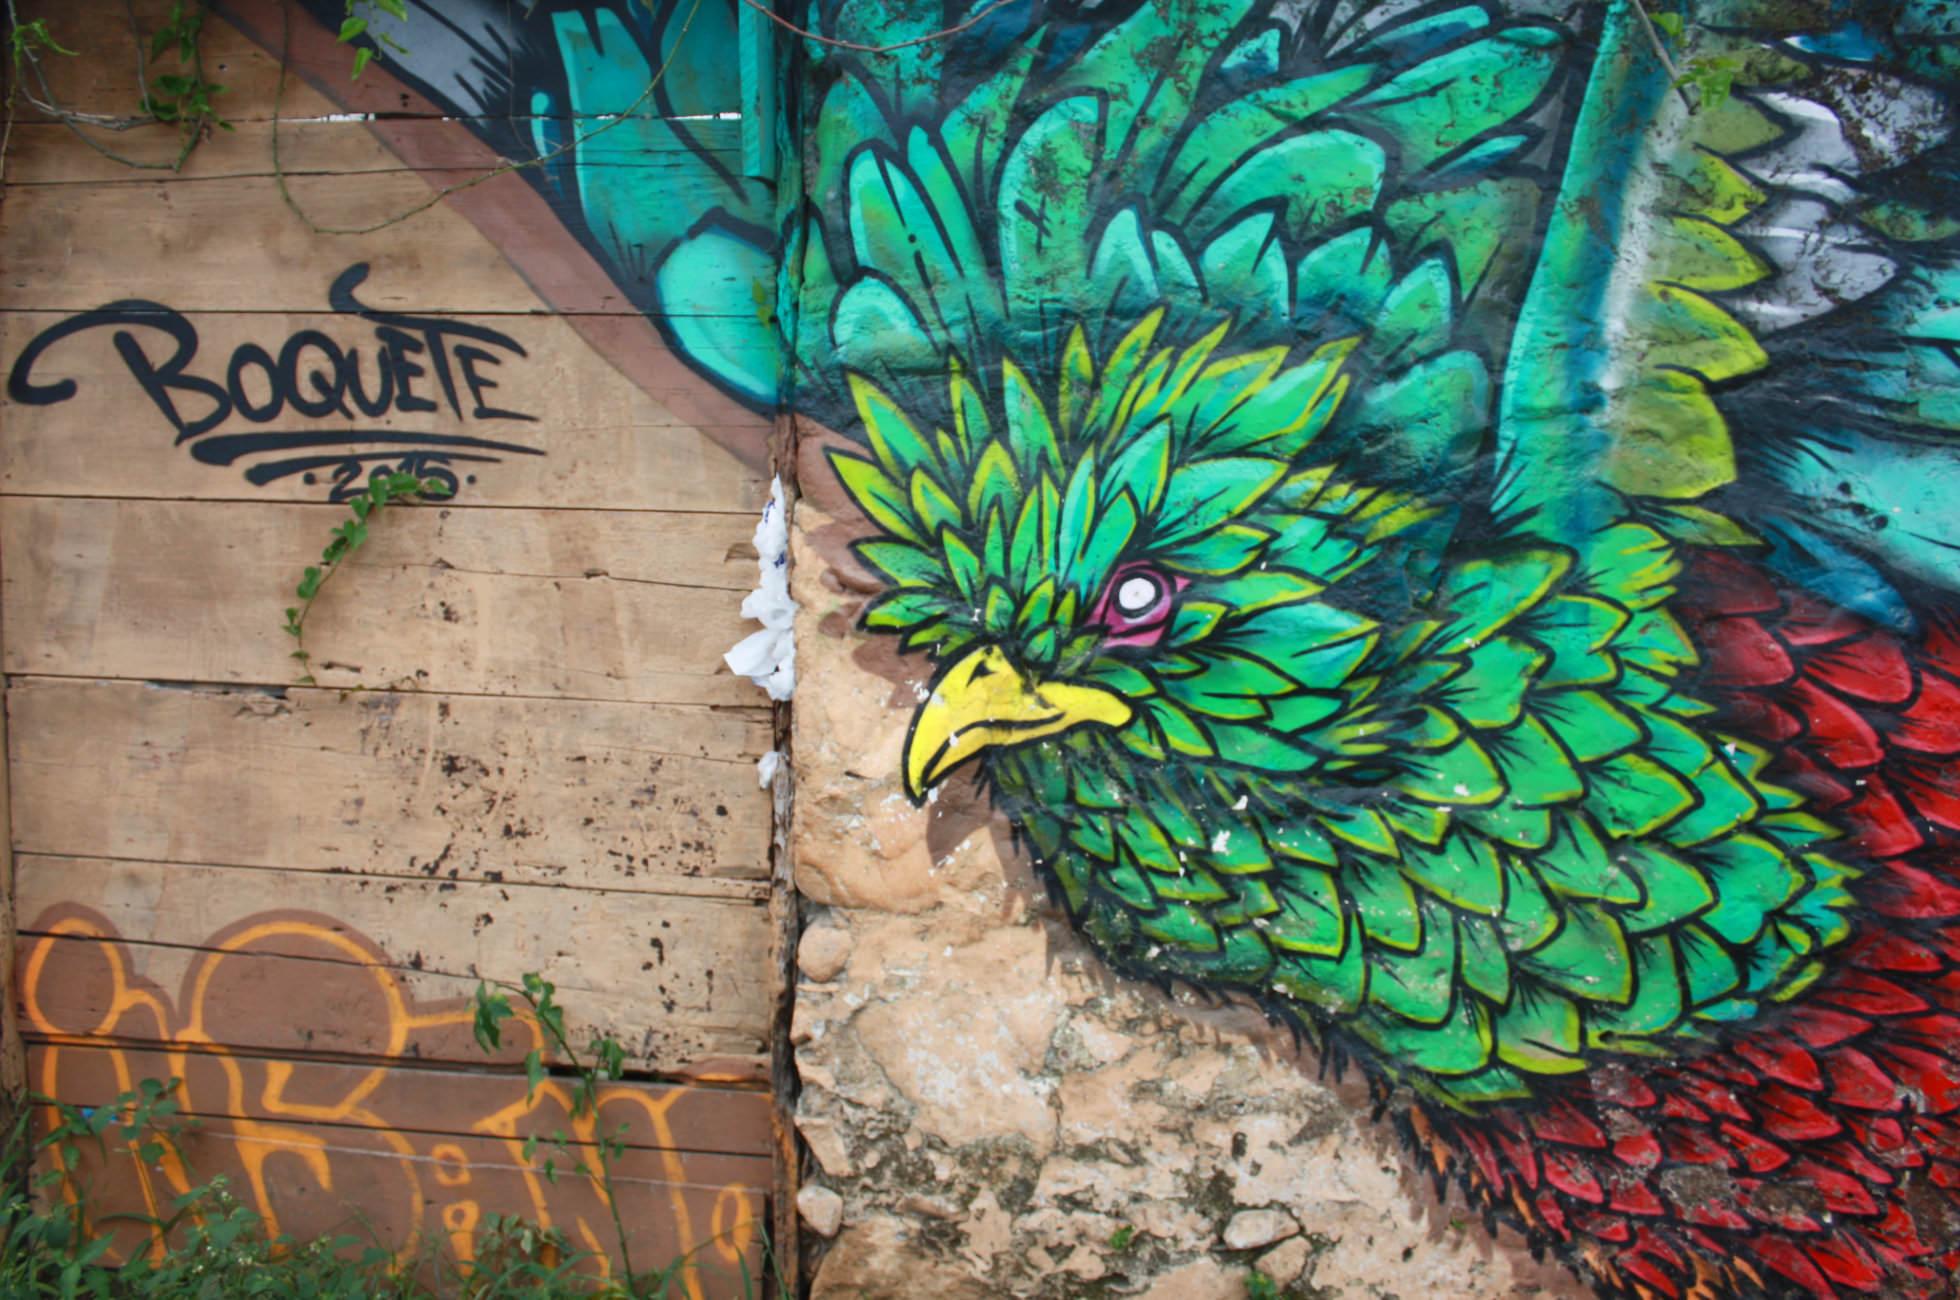 Street Art Boquete